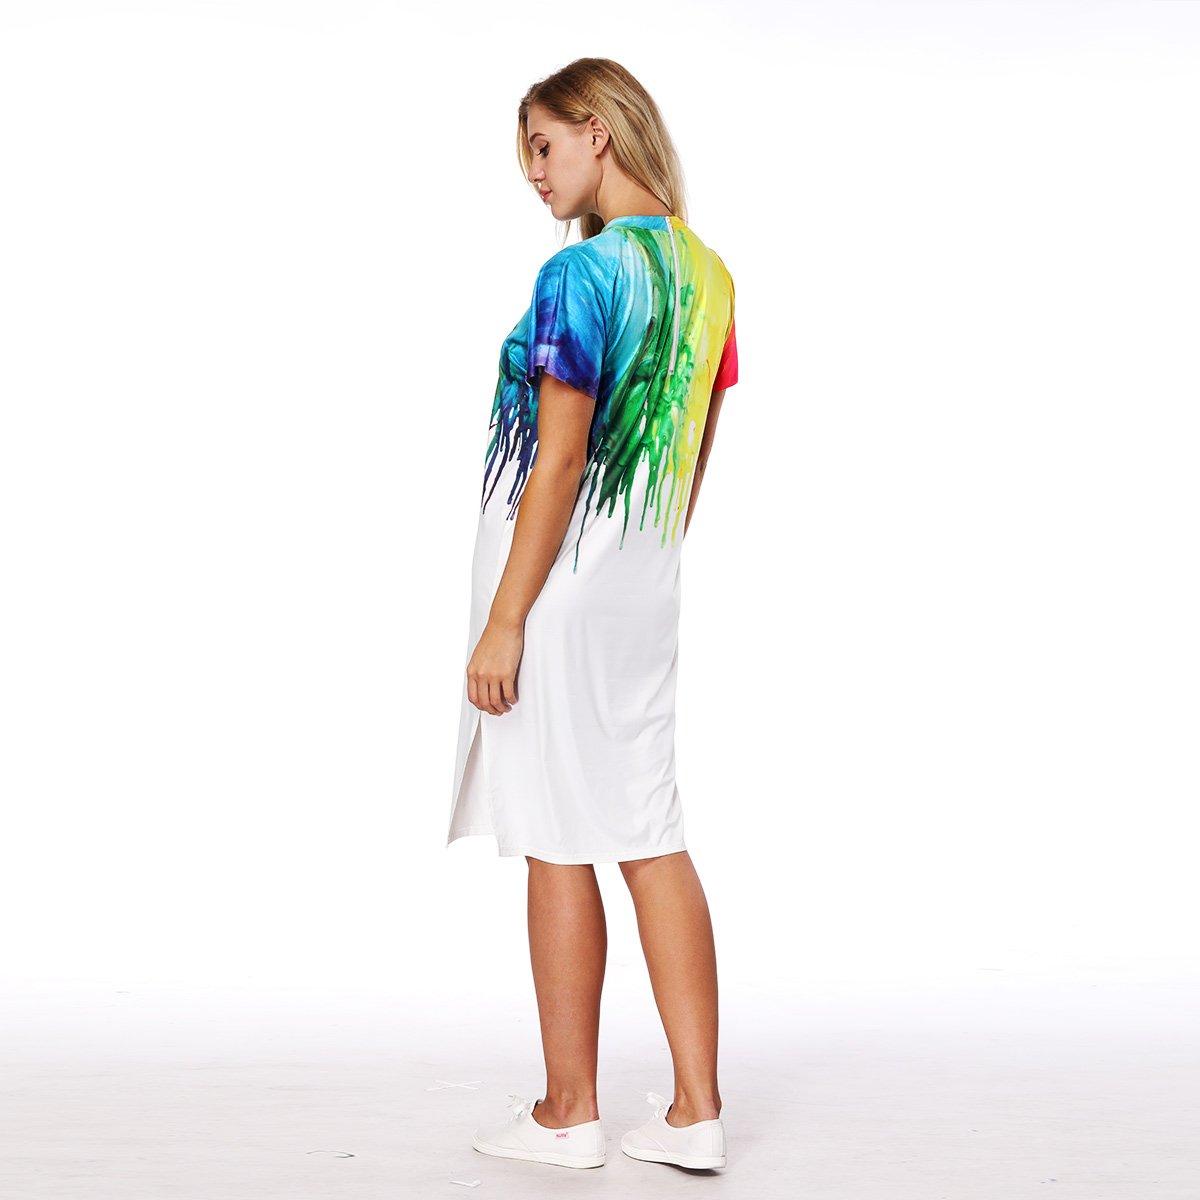 NOVAVOJO Brand Colorful 3D Paint Printing Long Girls T-Shirt Dress Summer Ladies Dress White Color Women Split Dress-XL